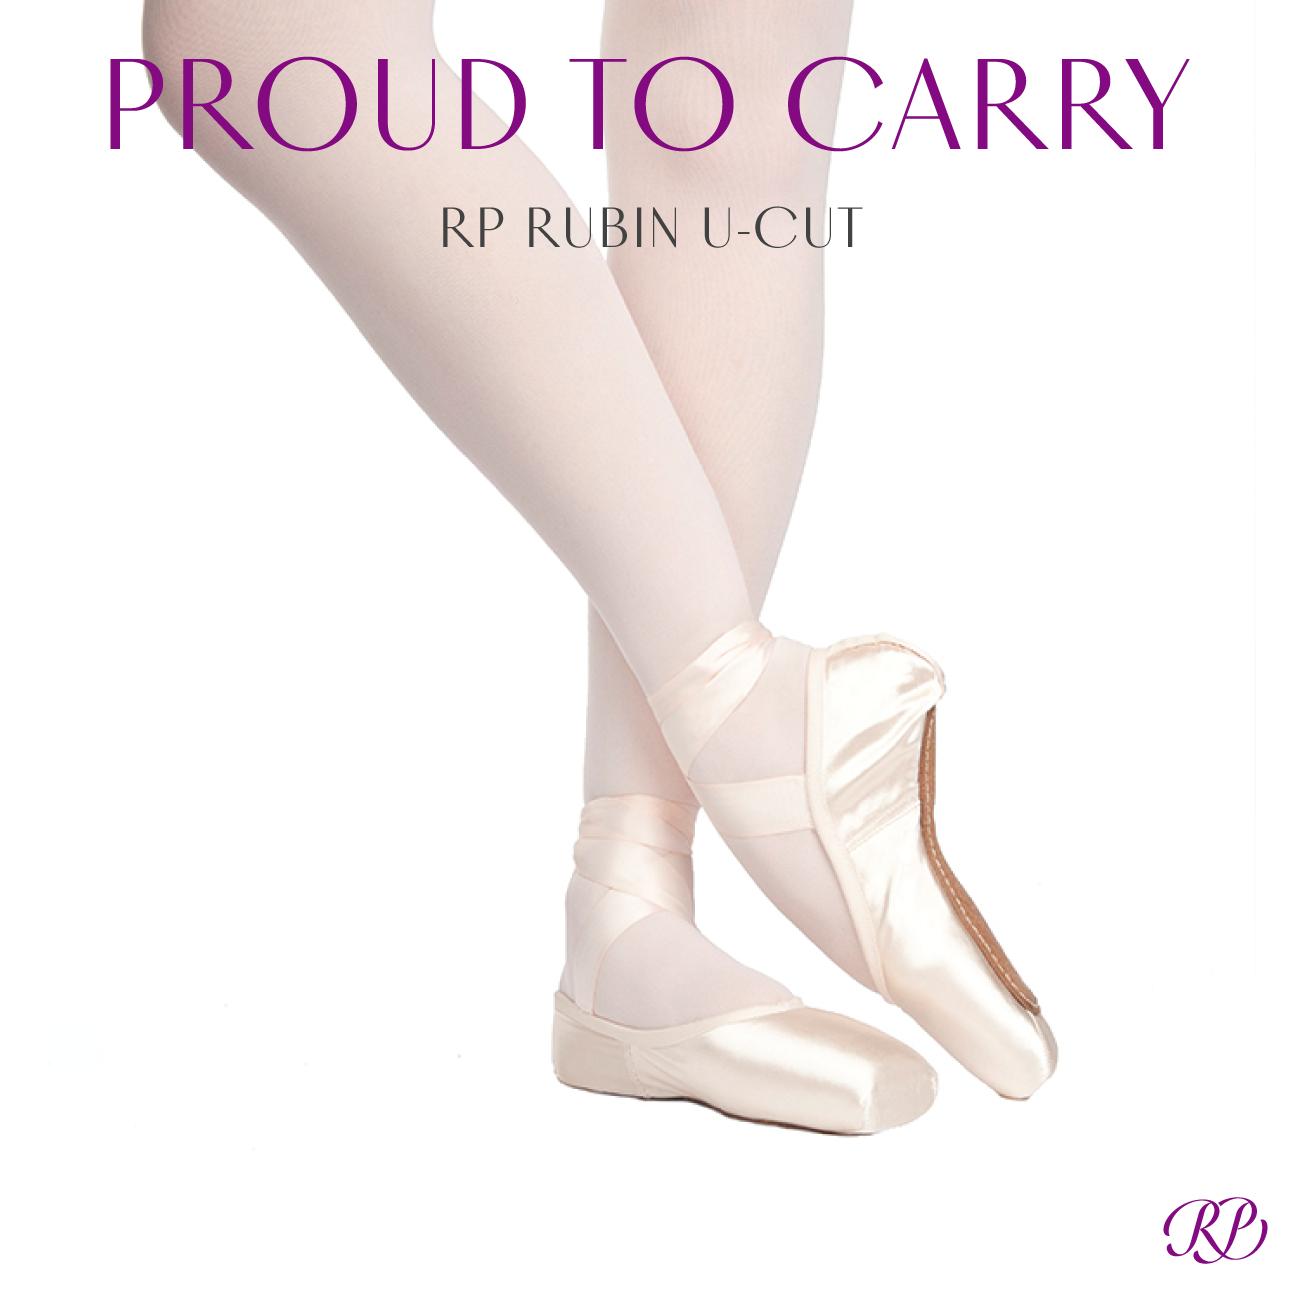 RP-Rubin-U-Cut_Retailers-New-Items